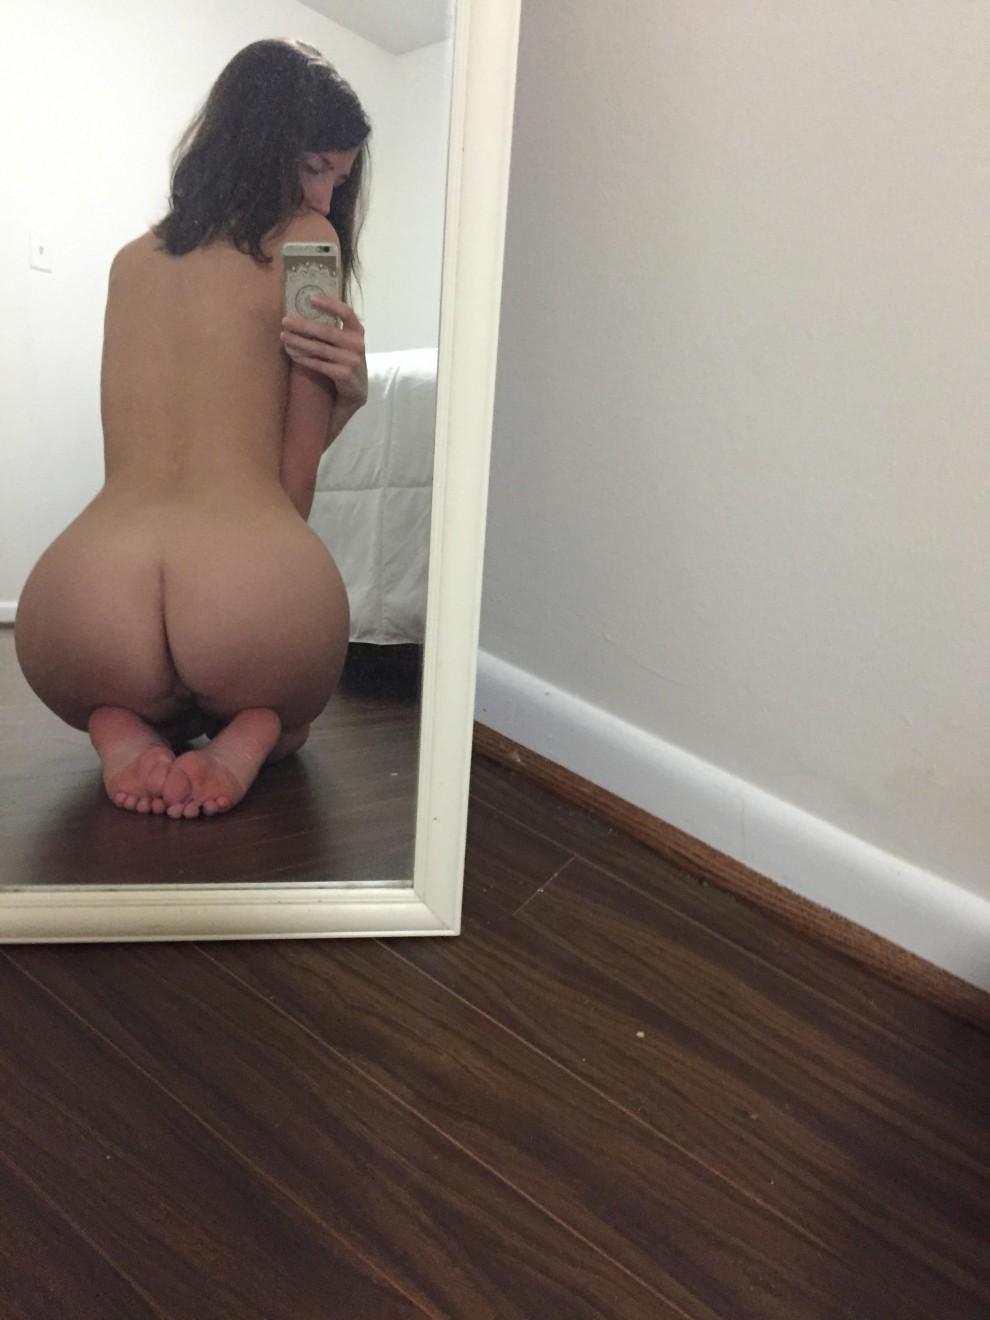 well here's my ass